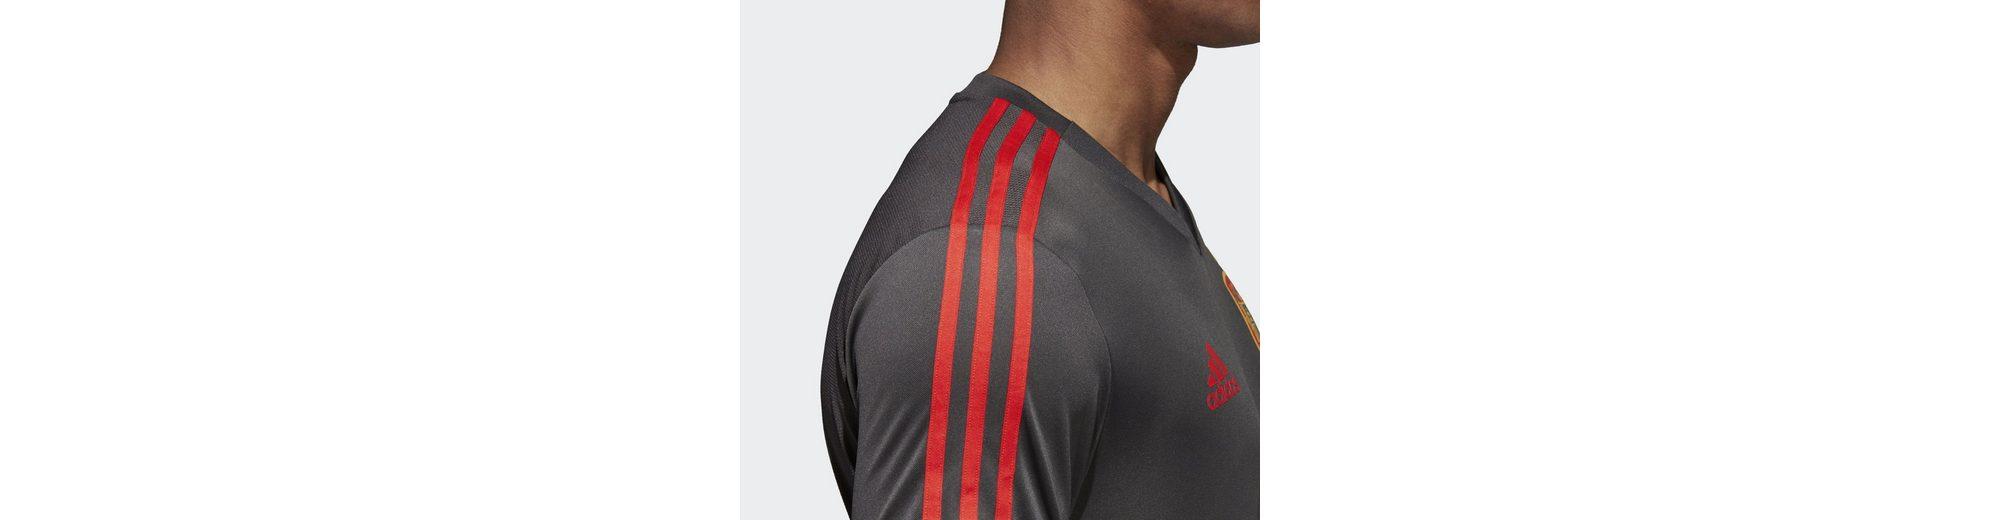 adidas Performance Footballtrikot Spanien Trainingstrikot Billig Verkauf Footlocker Bilder Frei Verschiffen Freies Verschiffen Sehr Billig Online-Shopping Zum Verkauf xj2Of6mgdc